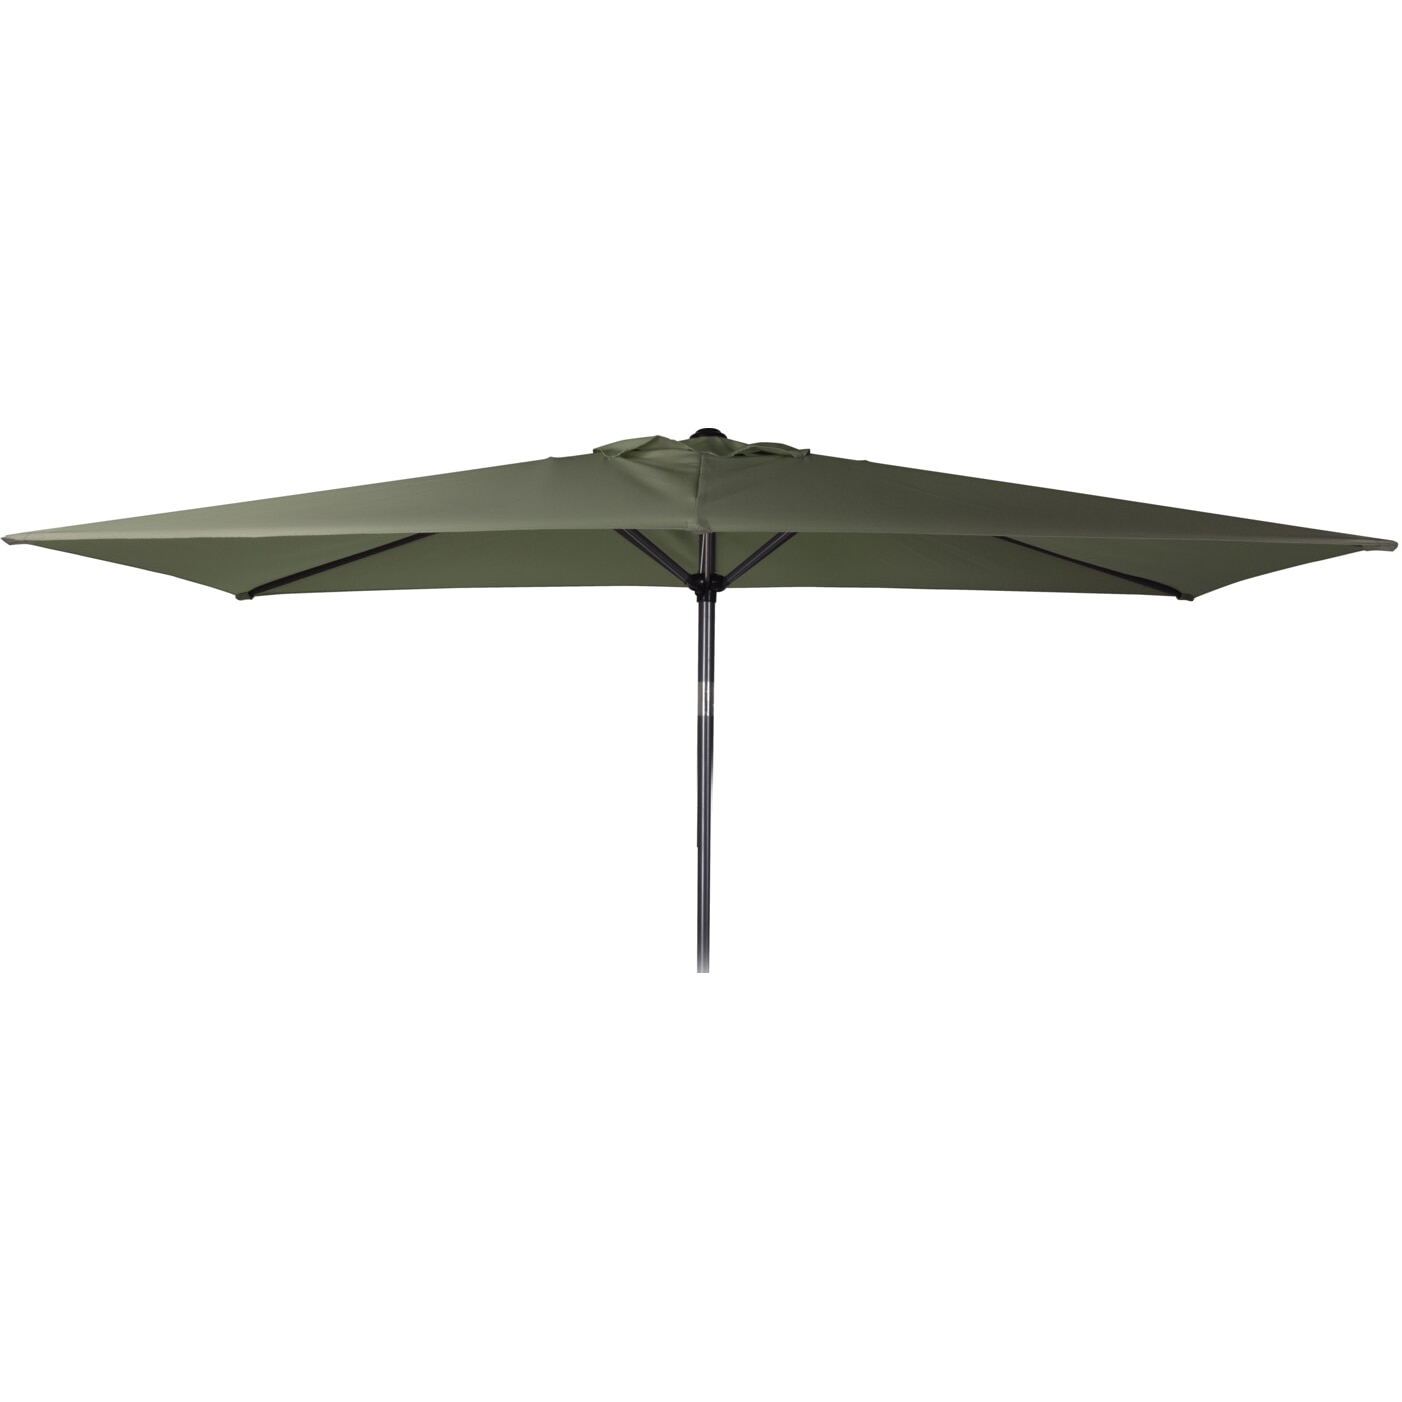 Fotografie Umbrela de soare Ambiance, 150x250cm, poliester 180 g/mp, verde